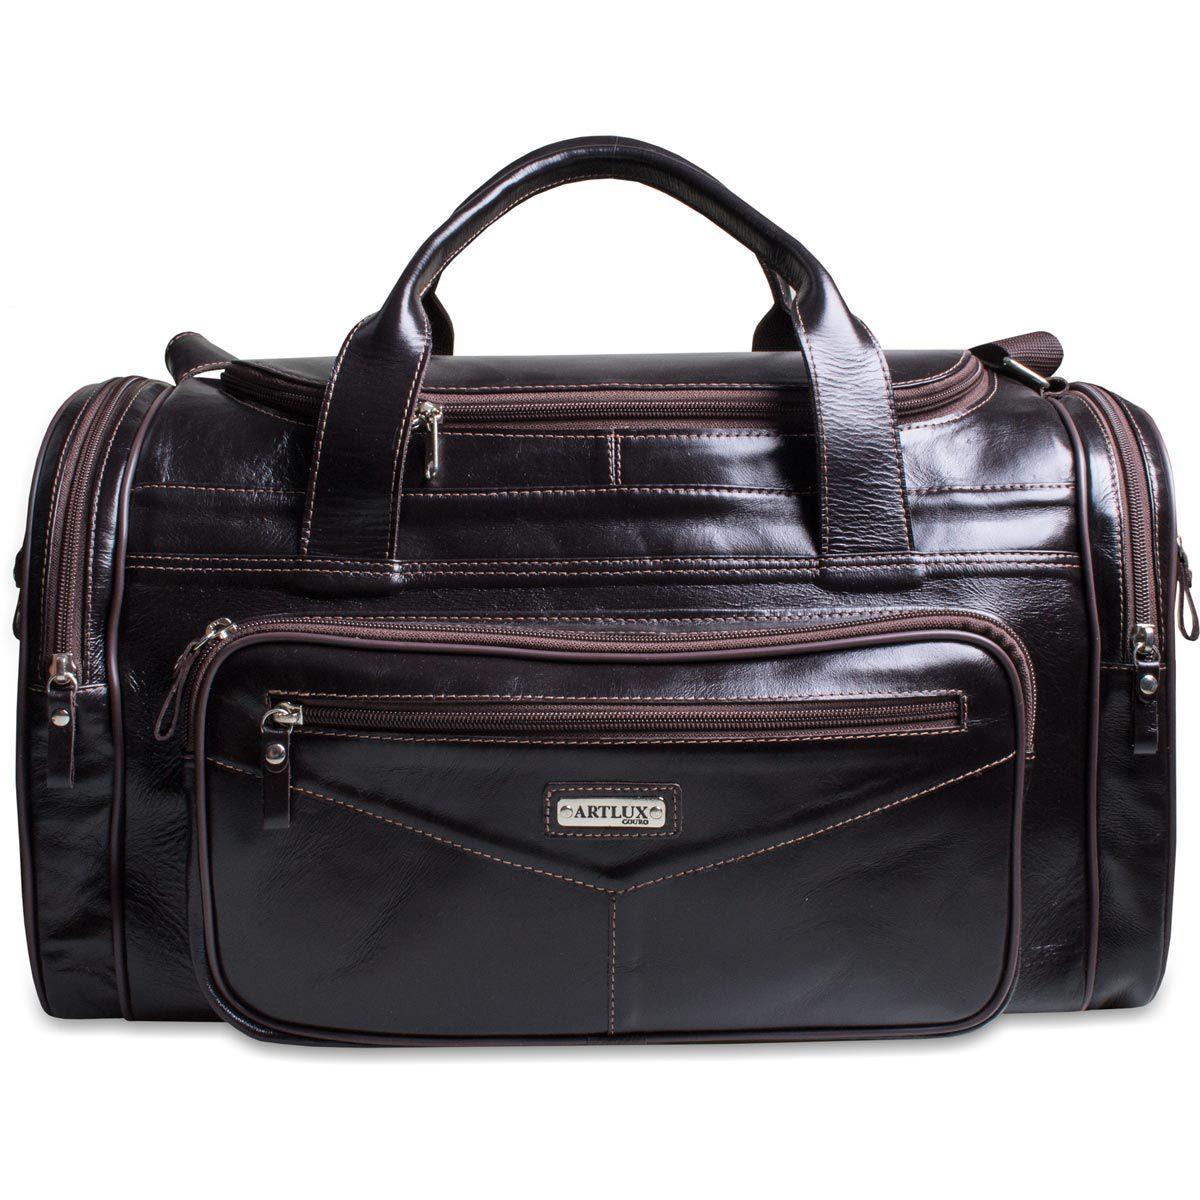 826d743cb5edd Bolsa para Viagem Artlux